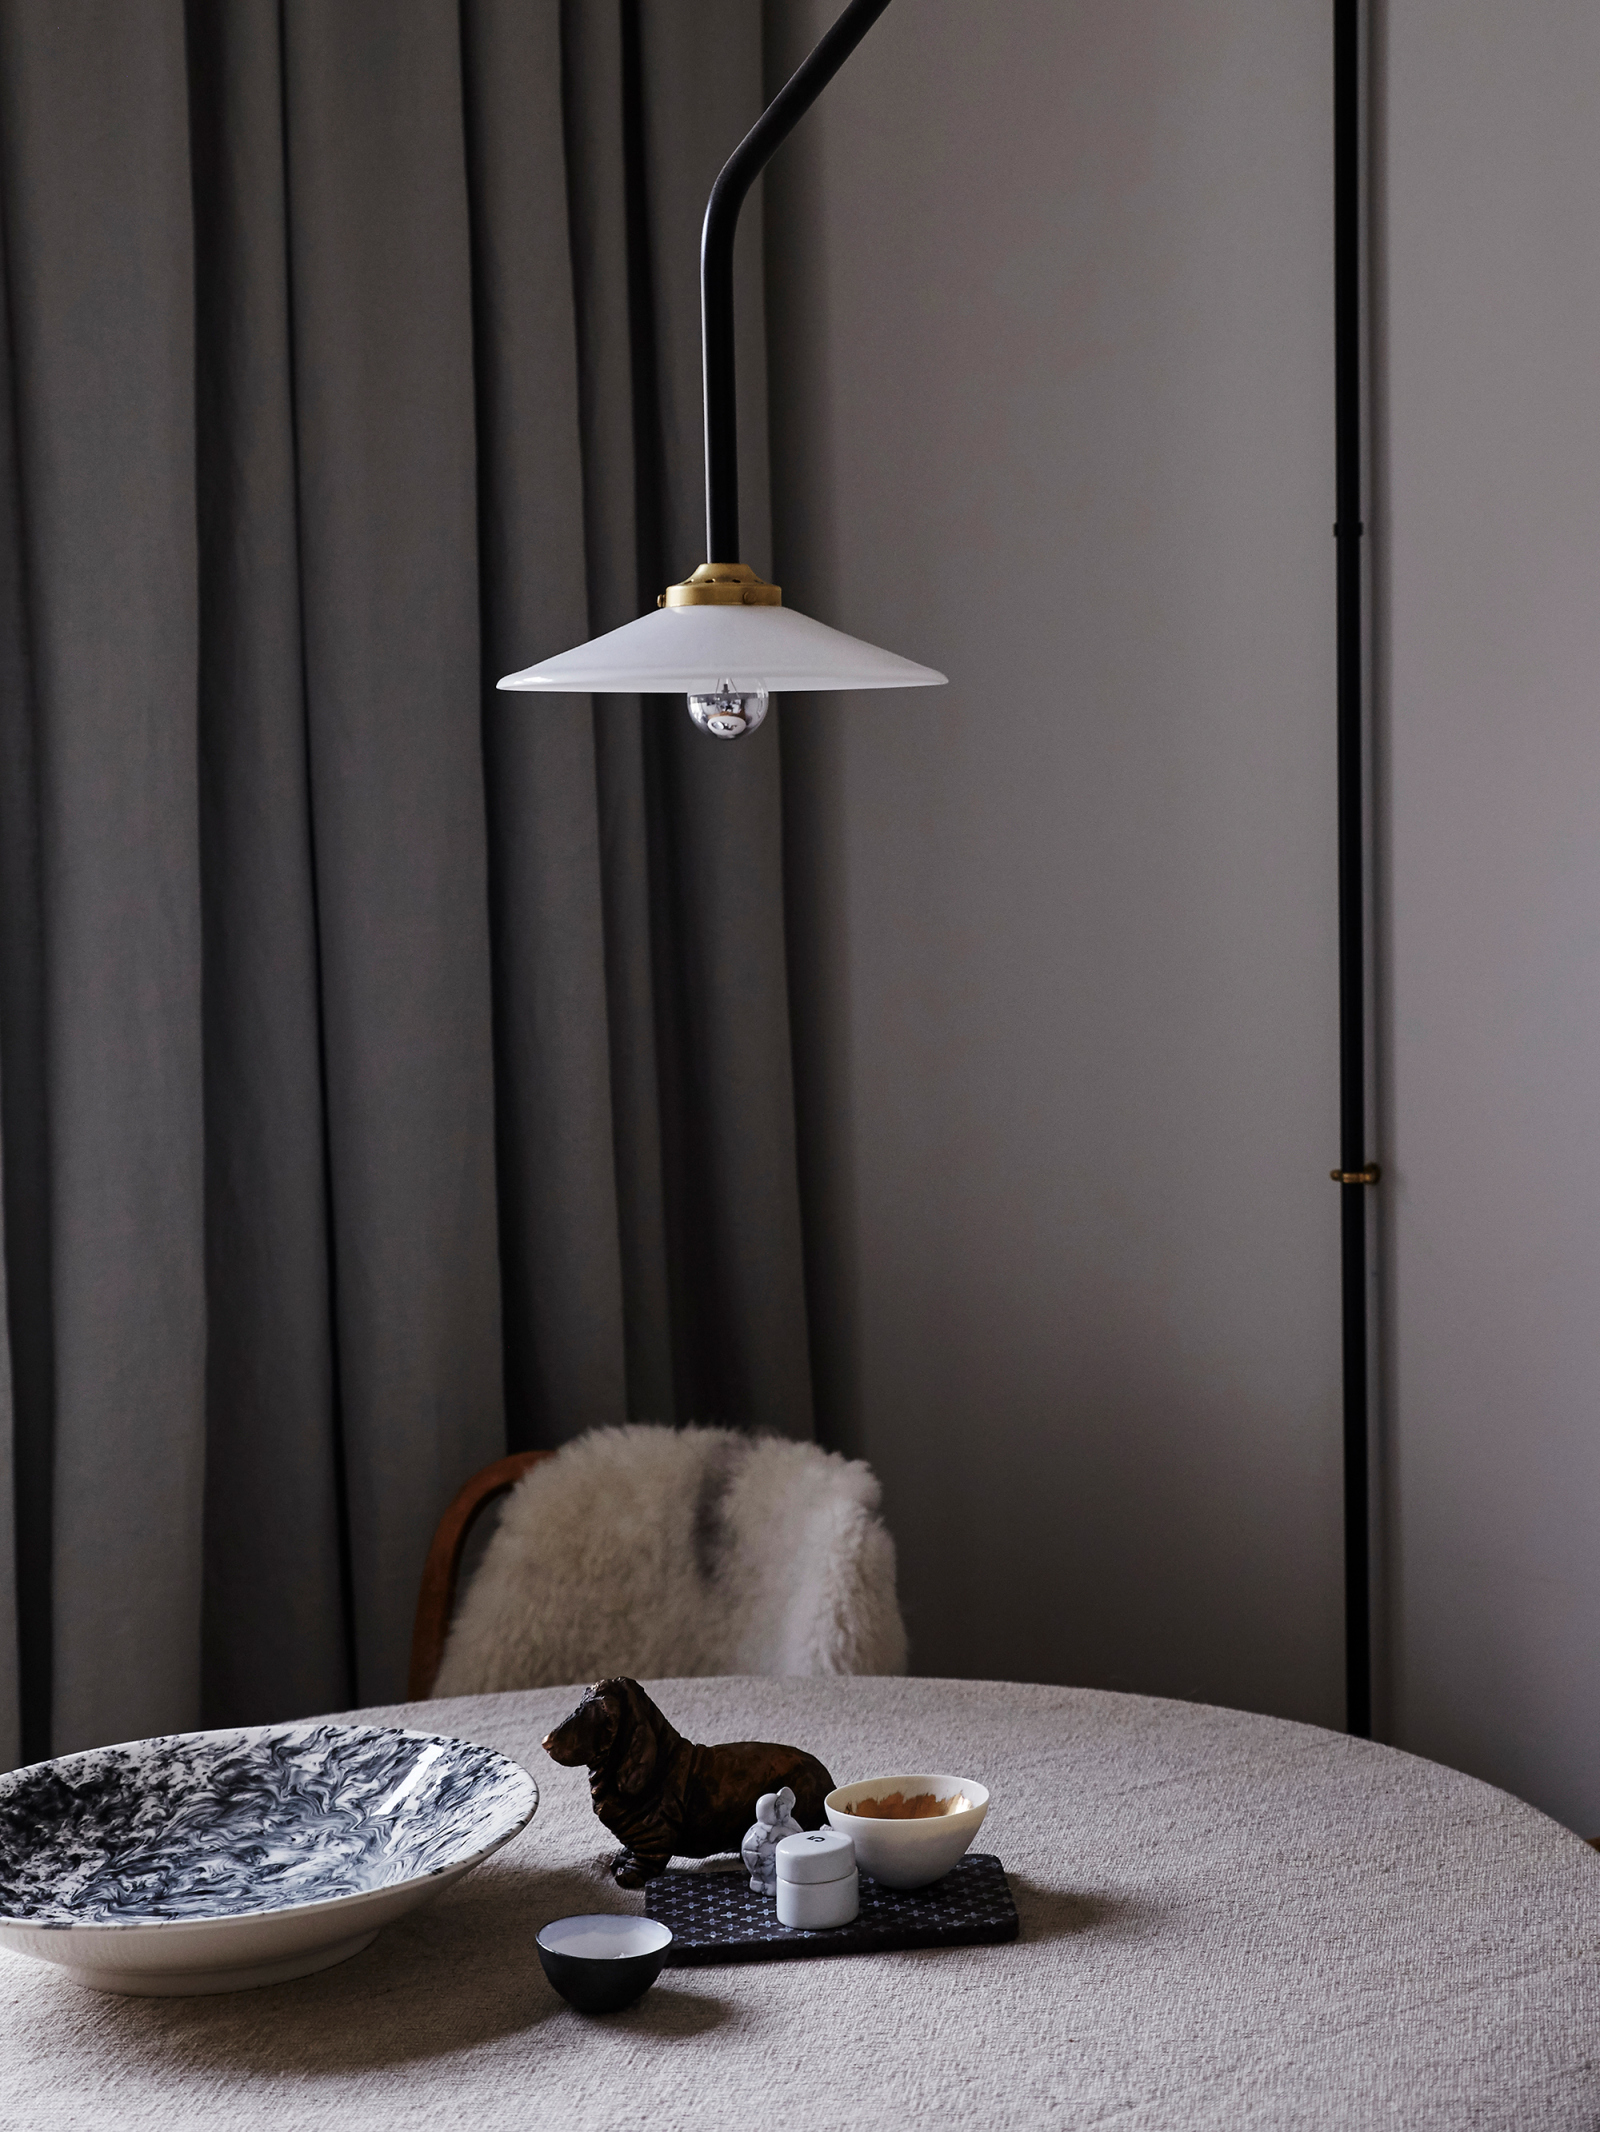 Hanging lamp n4, Slick bowls